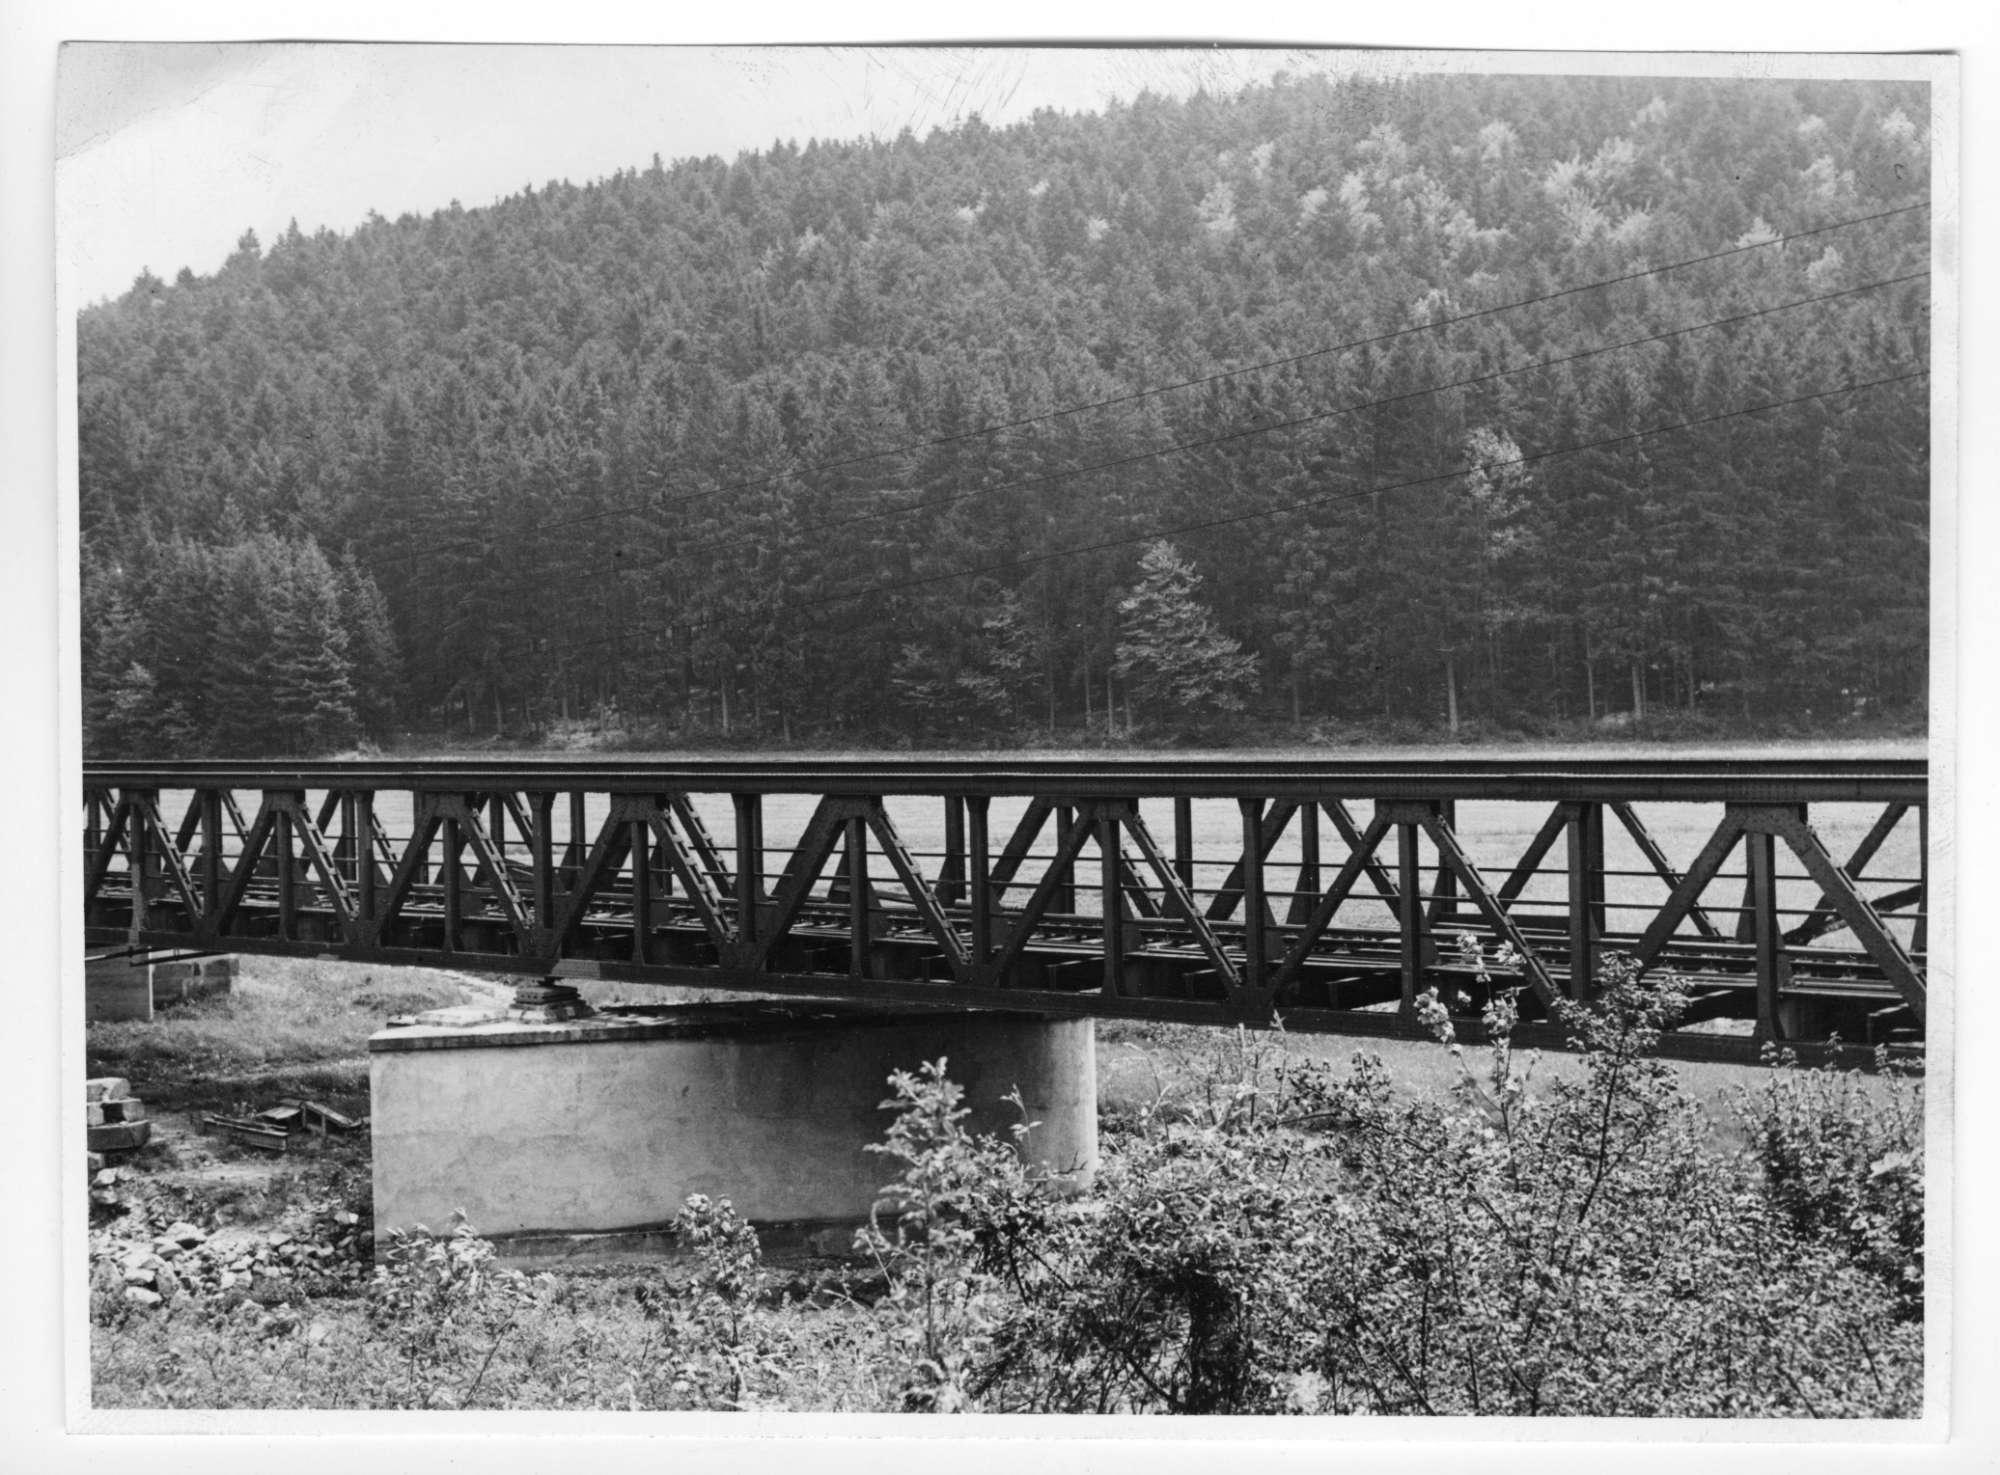 Strecke Neckarhausen-Horb (Neckarbrücke), Abb. b